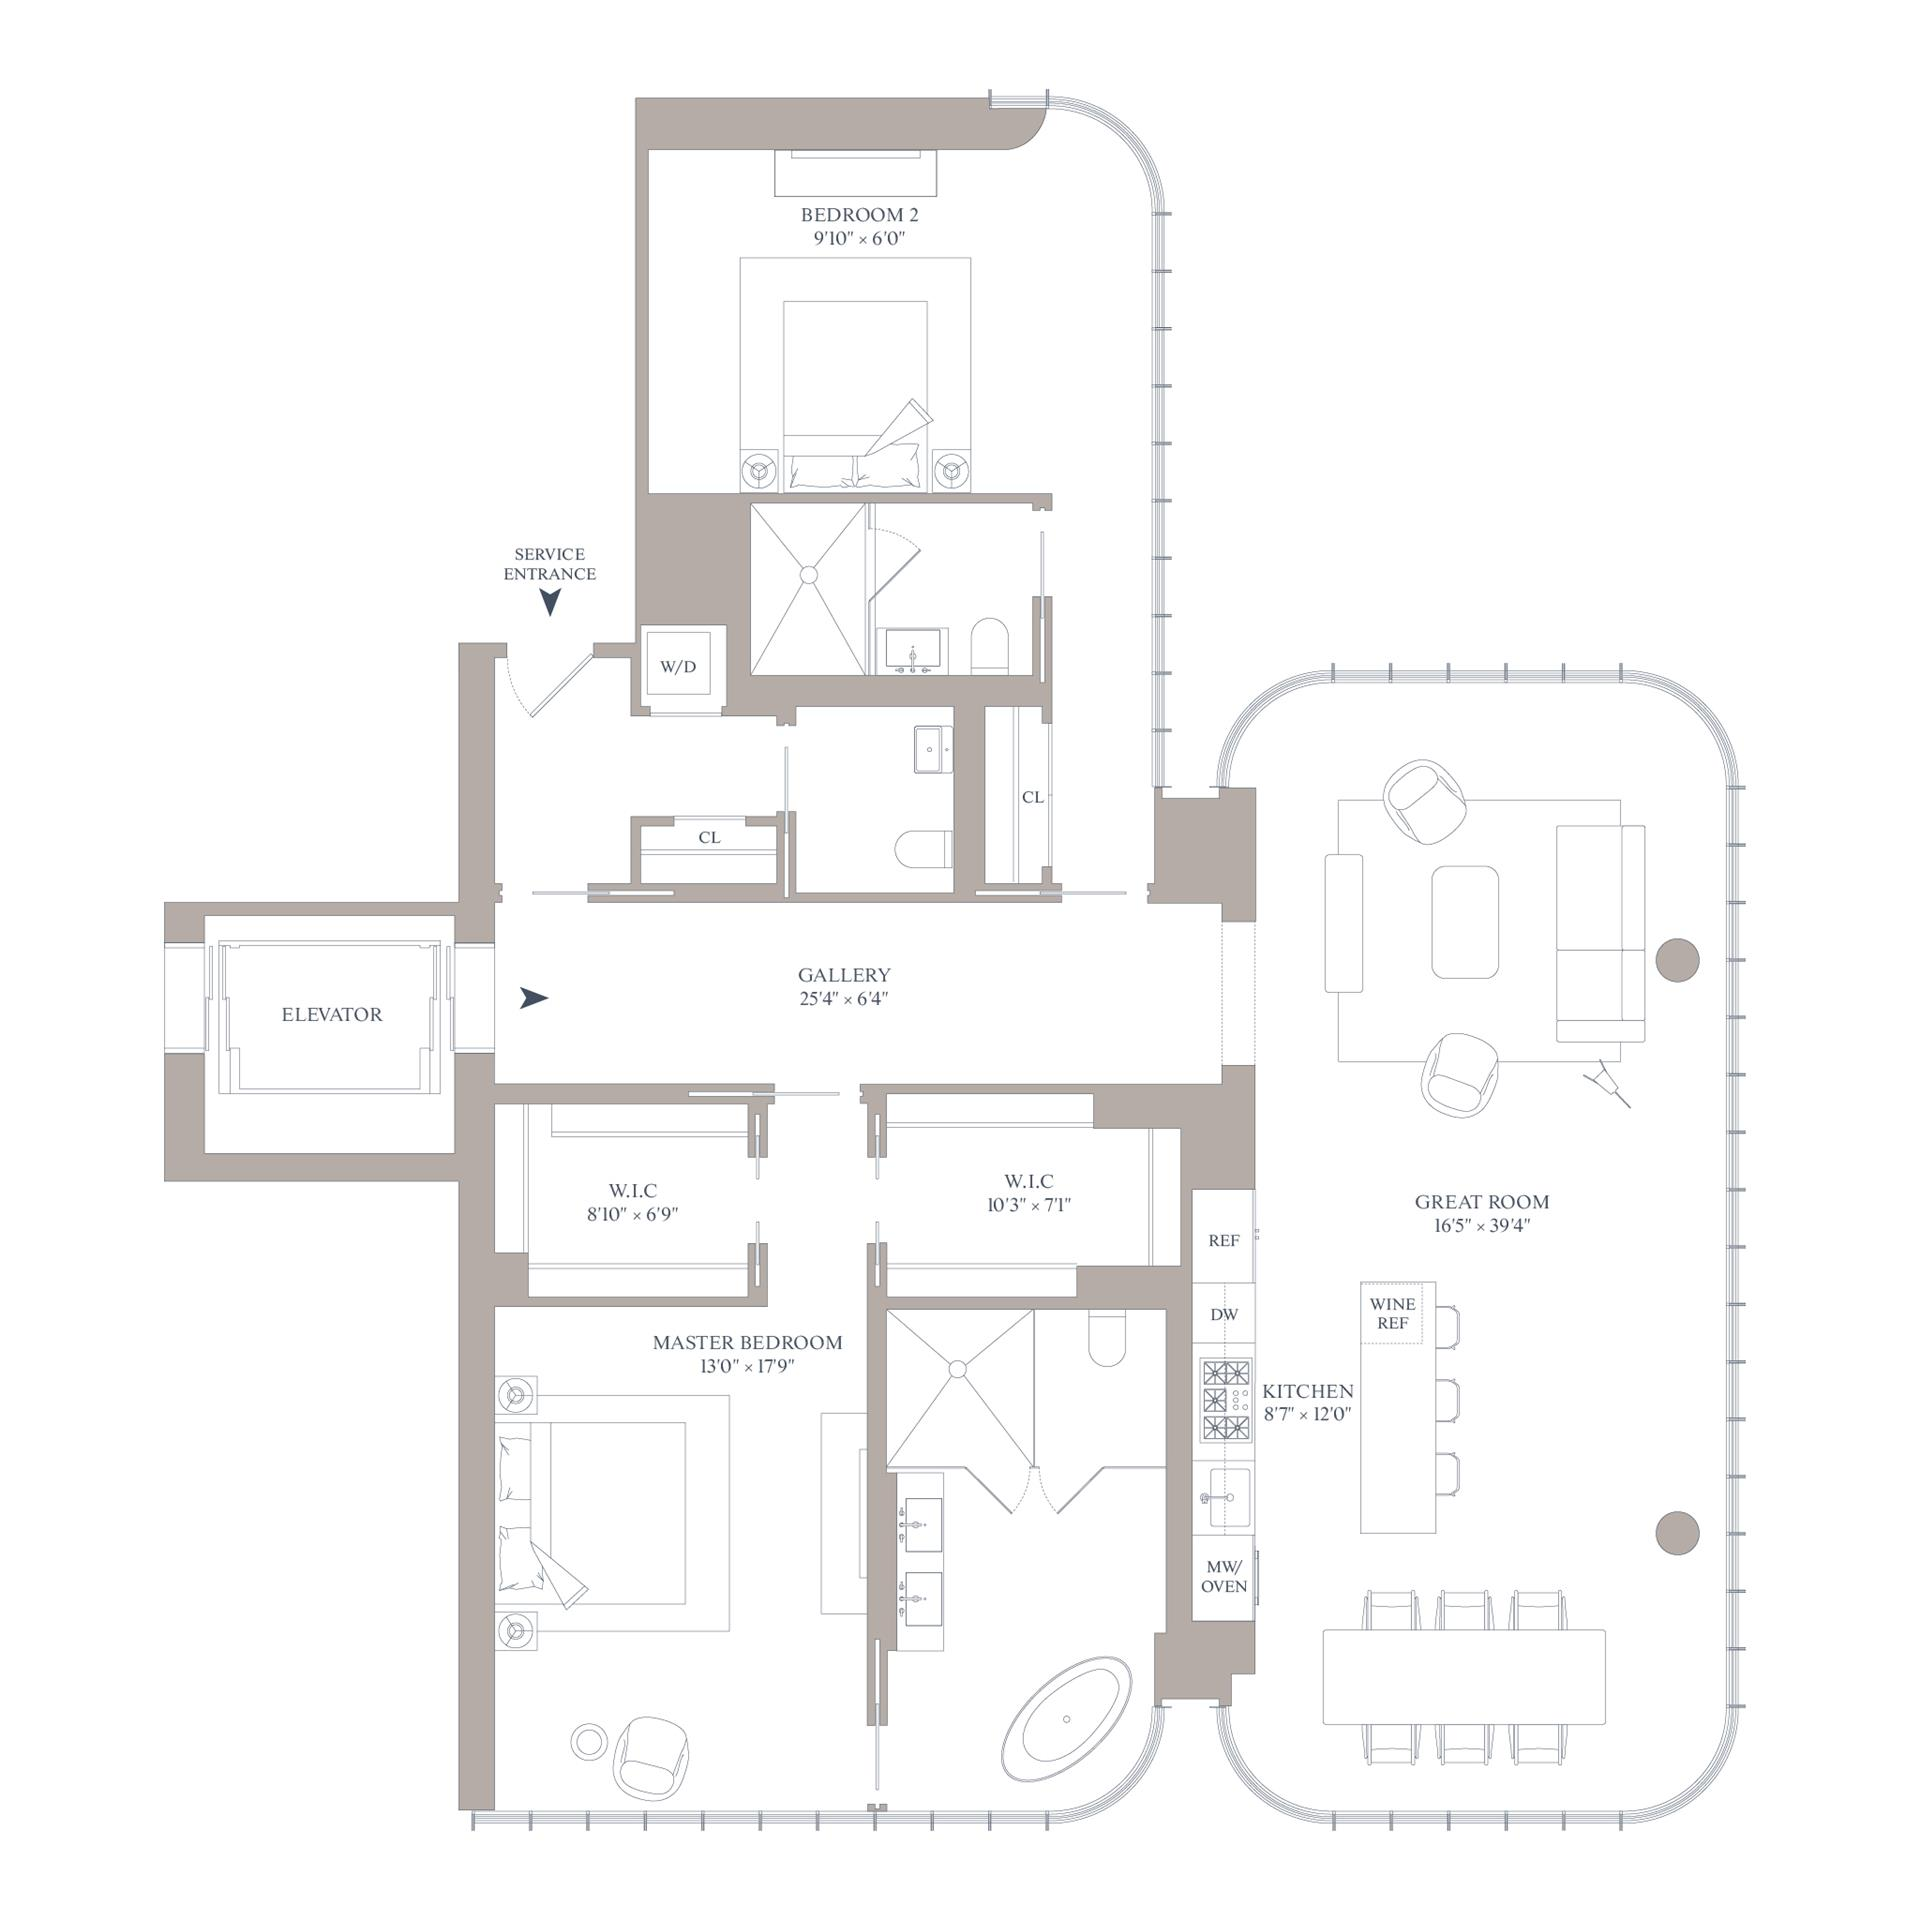 Floor plan of 565 Broome St, S26B - SoHo - Nolita, New York